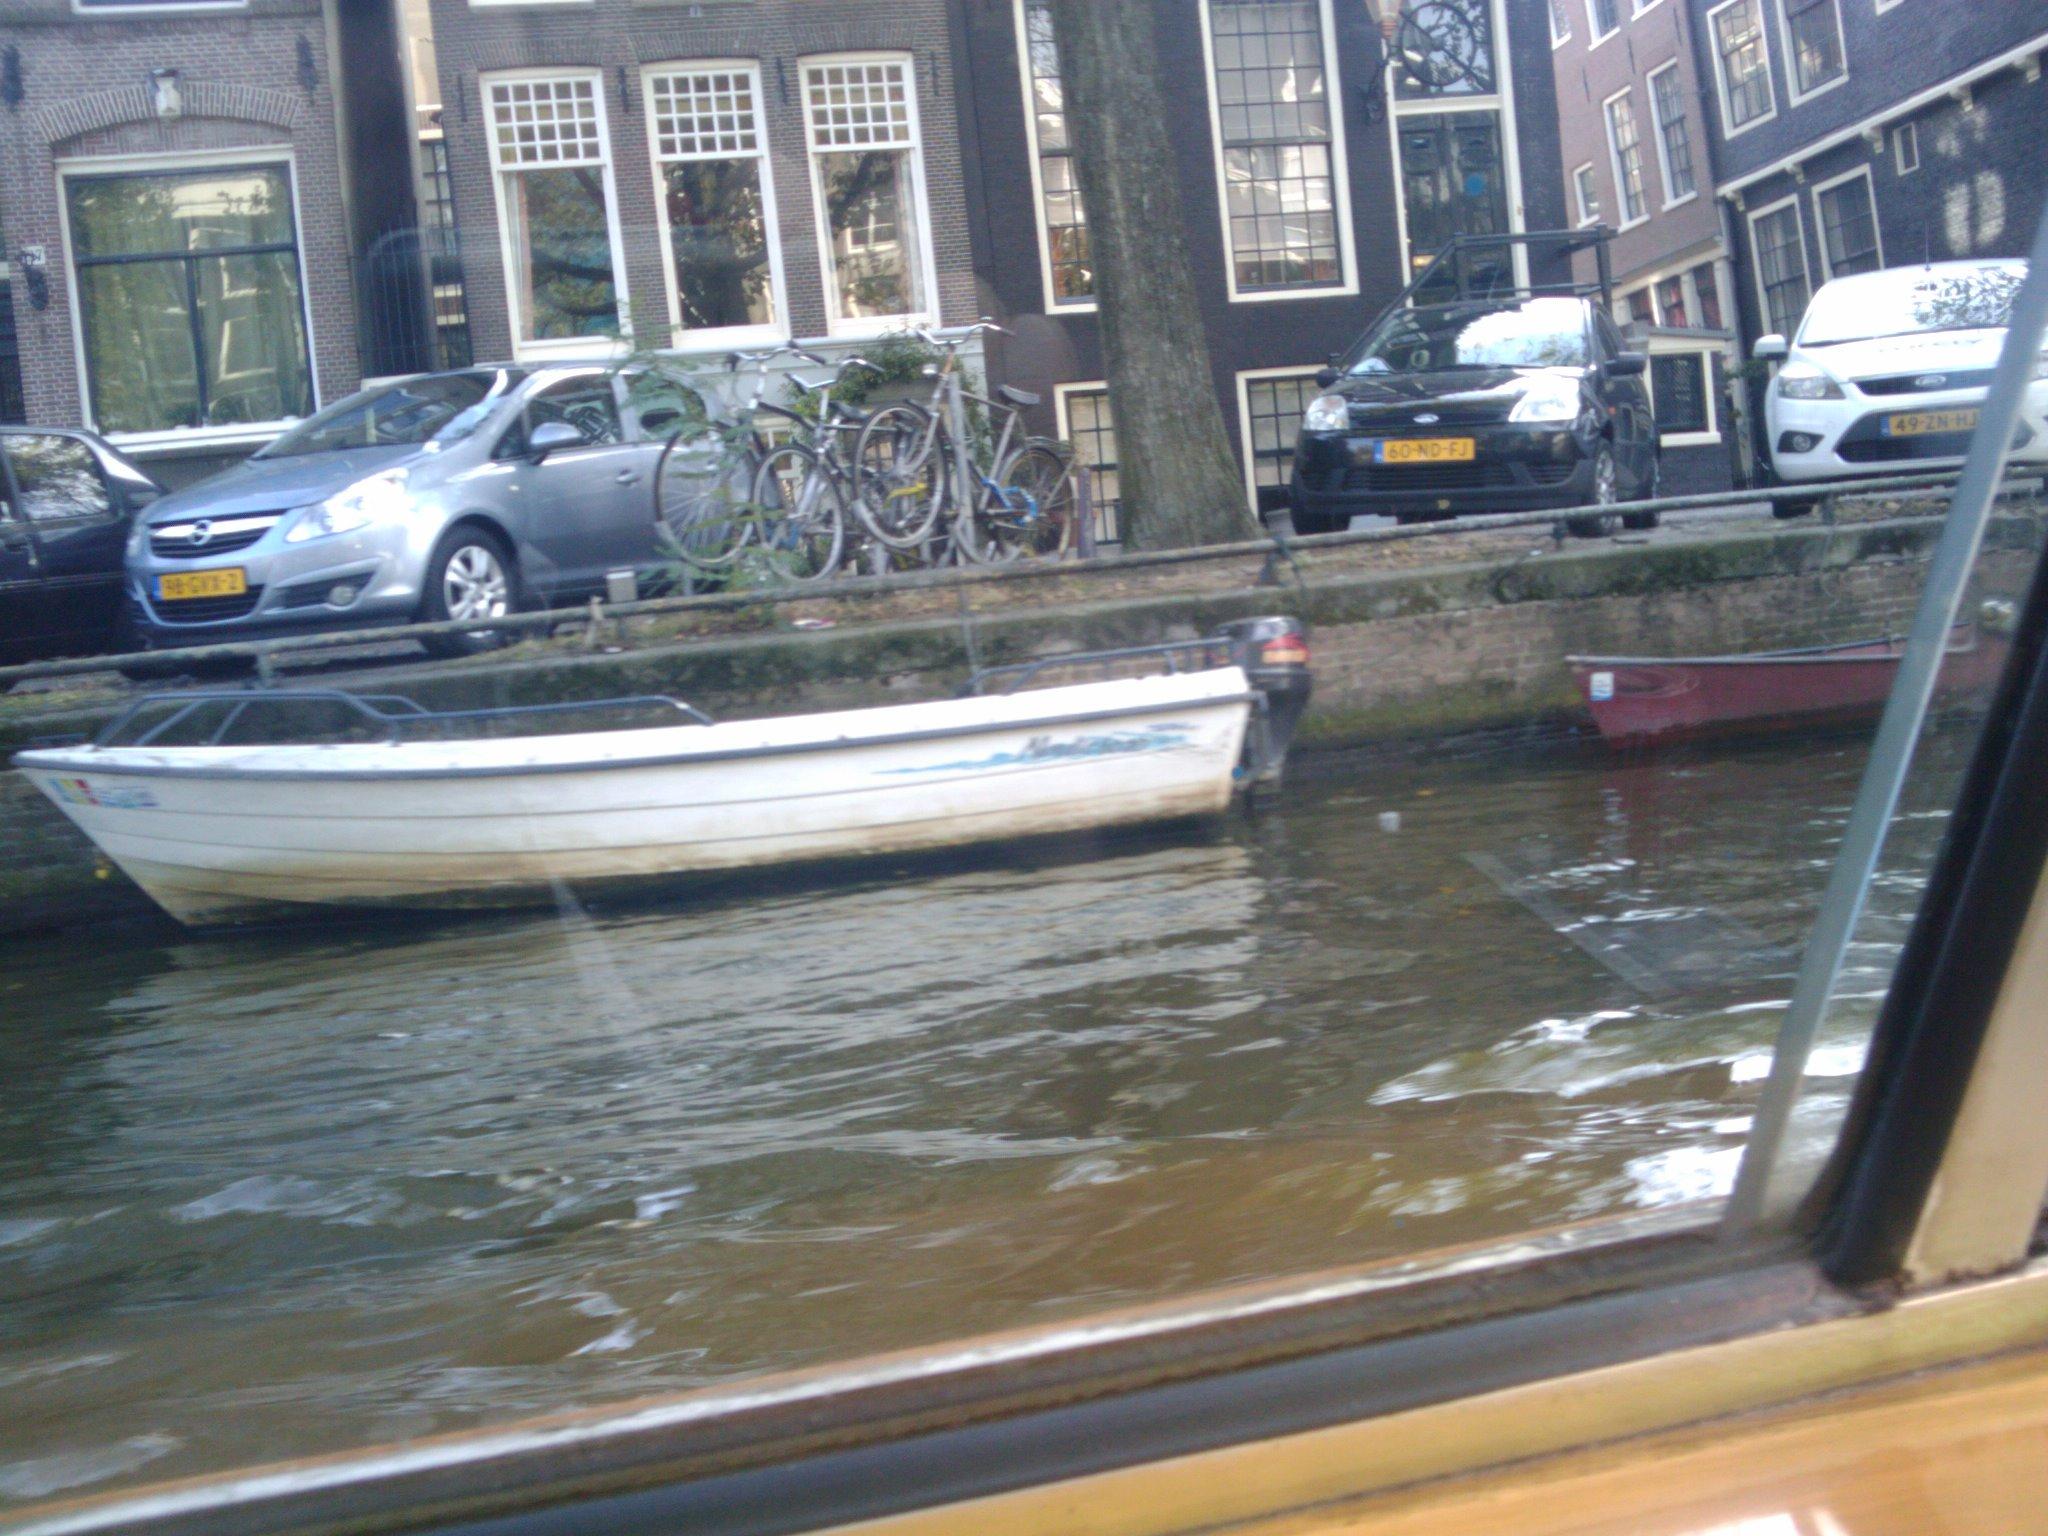 boatscarsbikes